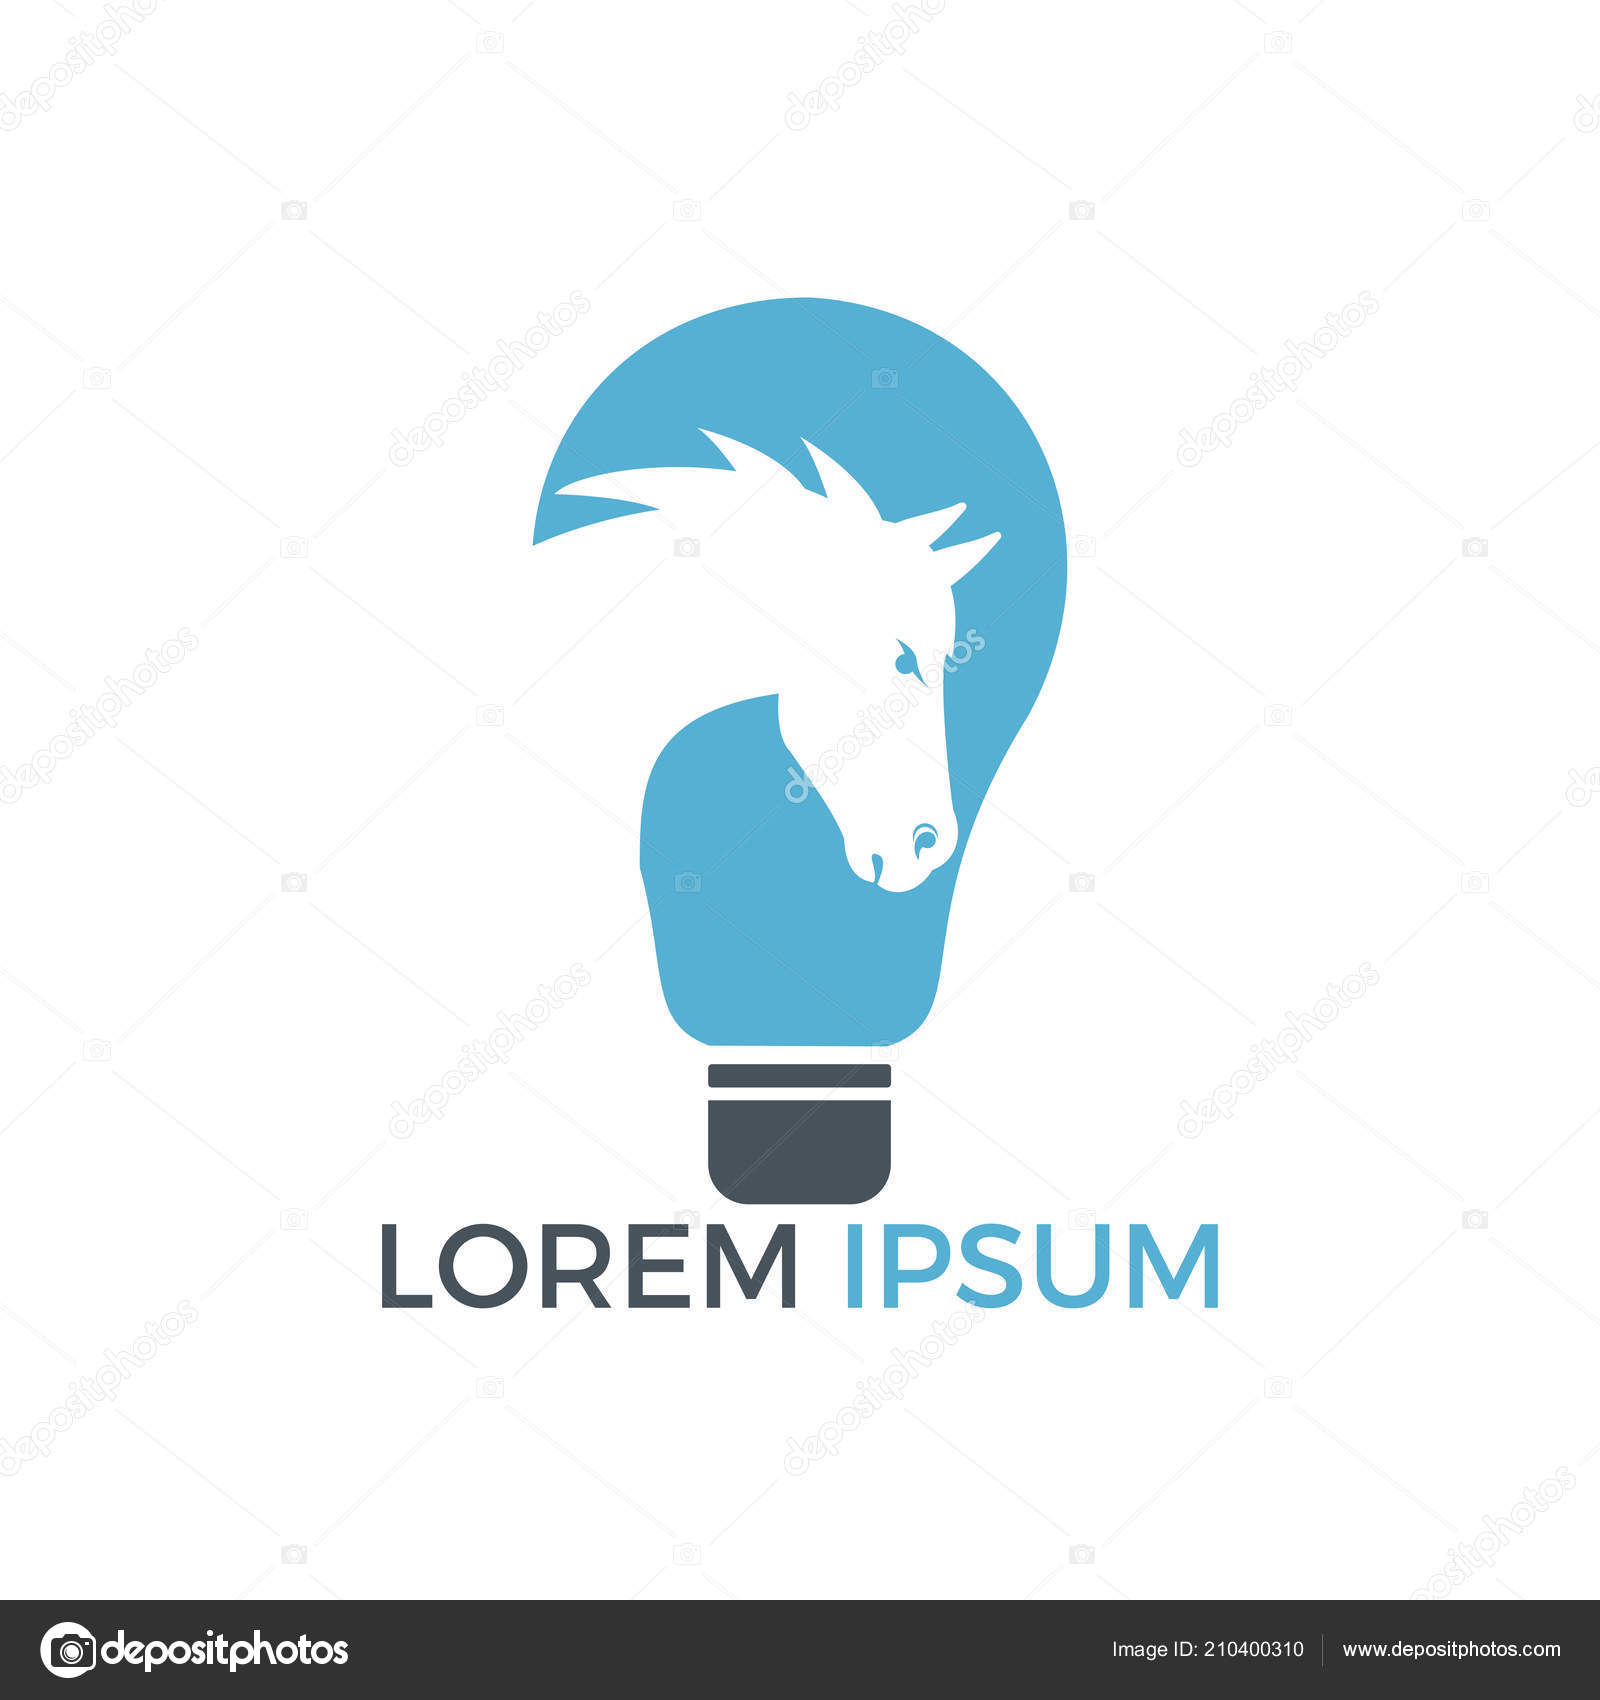 Light Bulb Horse Logo Design Wild Ideas Logo Concept Stock Vector C Irfankhanalvi 210400310